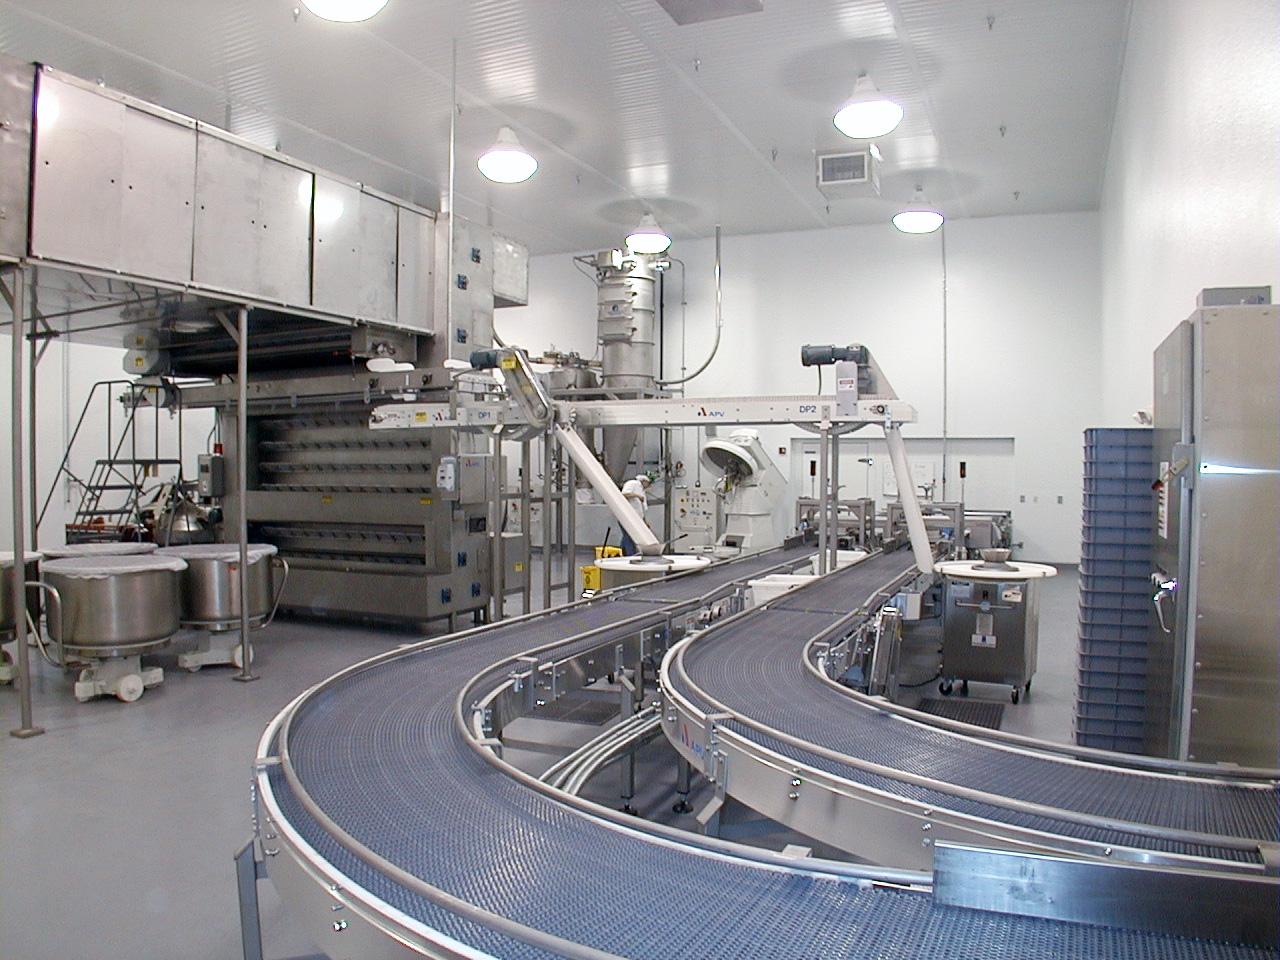 Industrial Interior 1